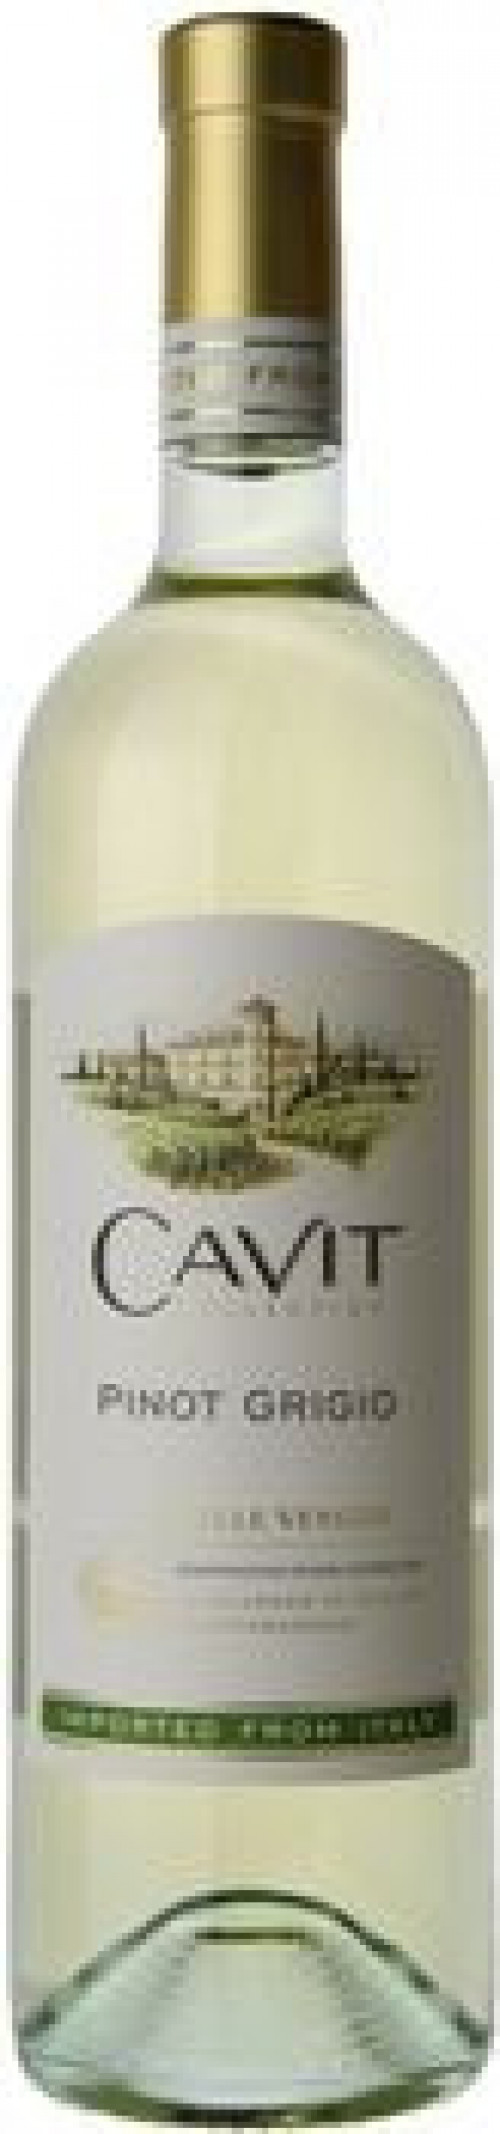 Cavit Pinot Grigio 750ml